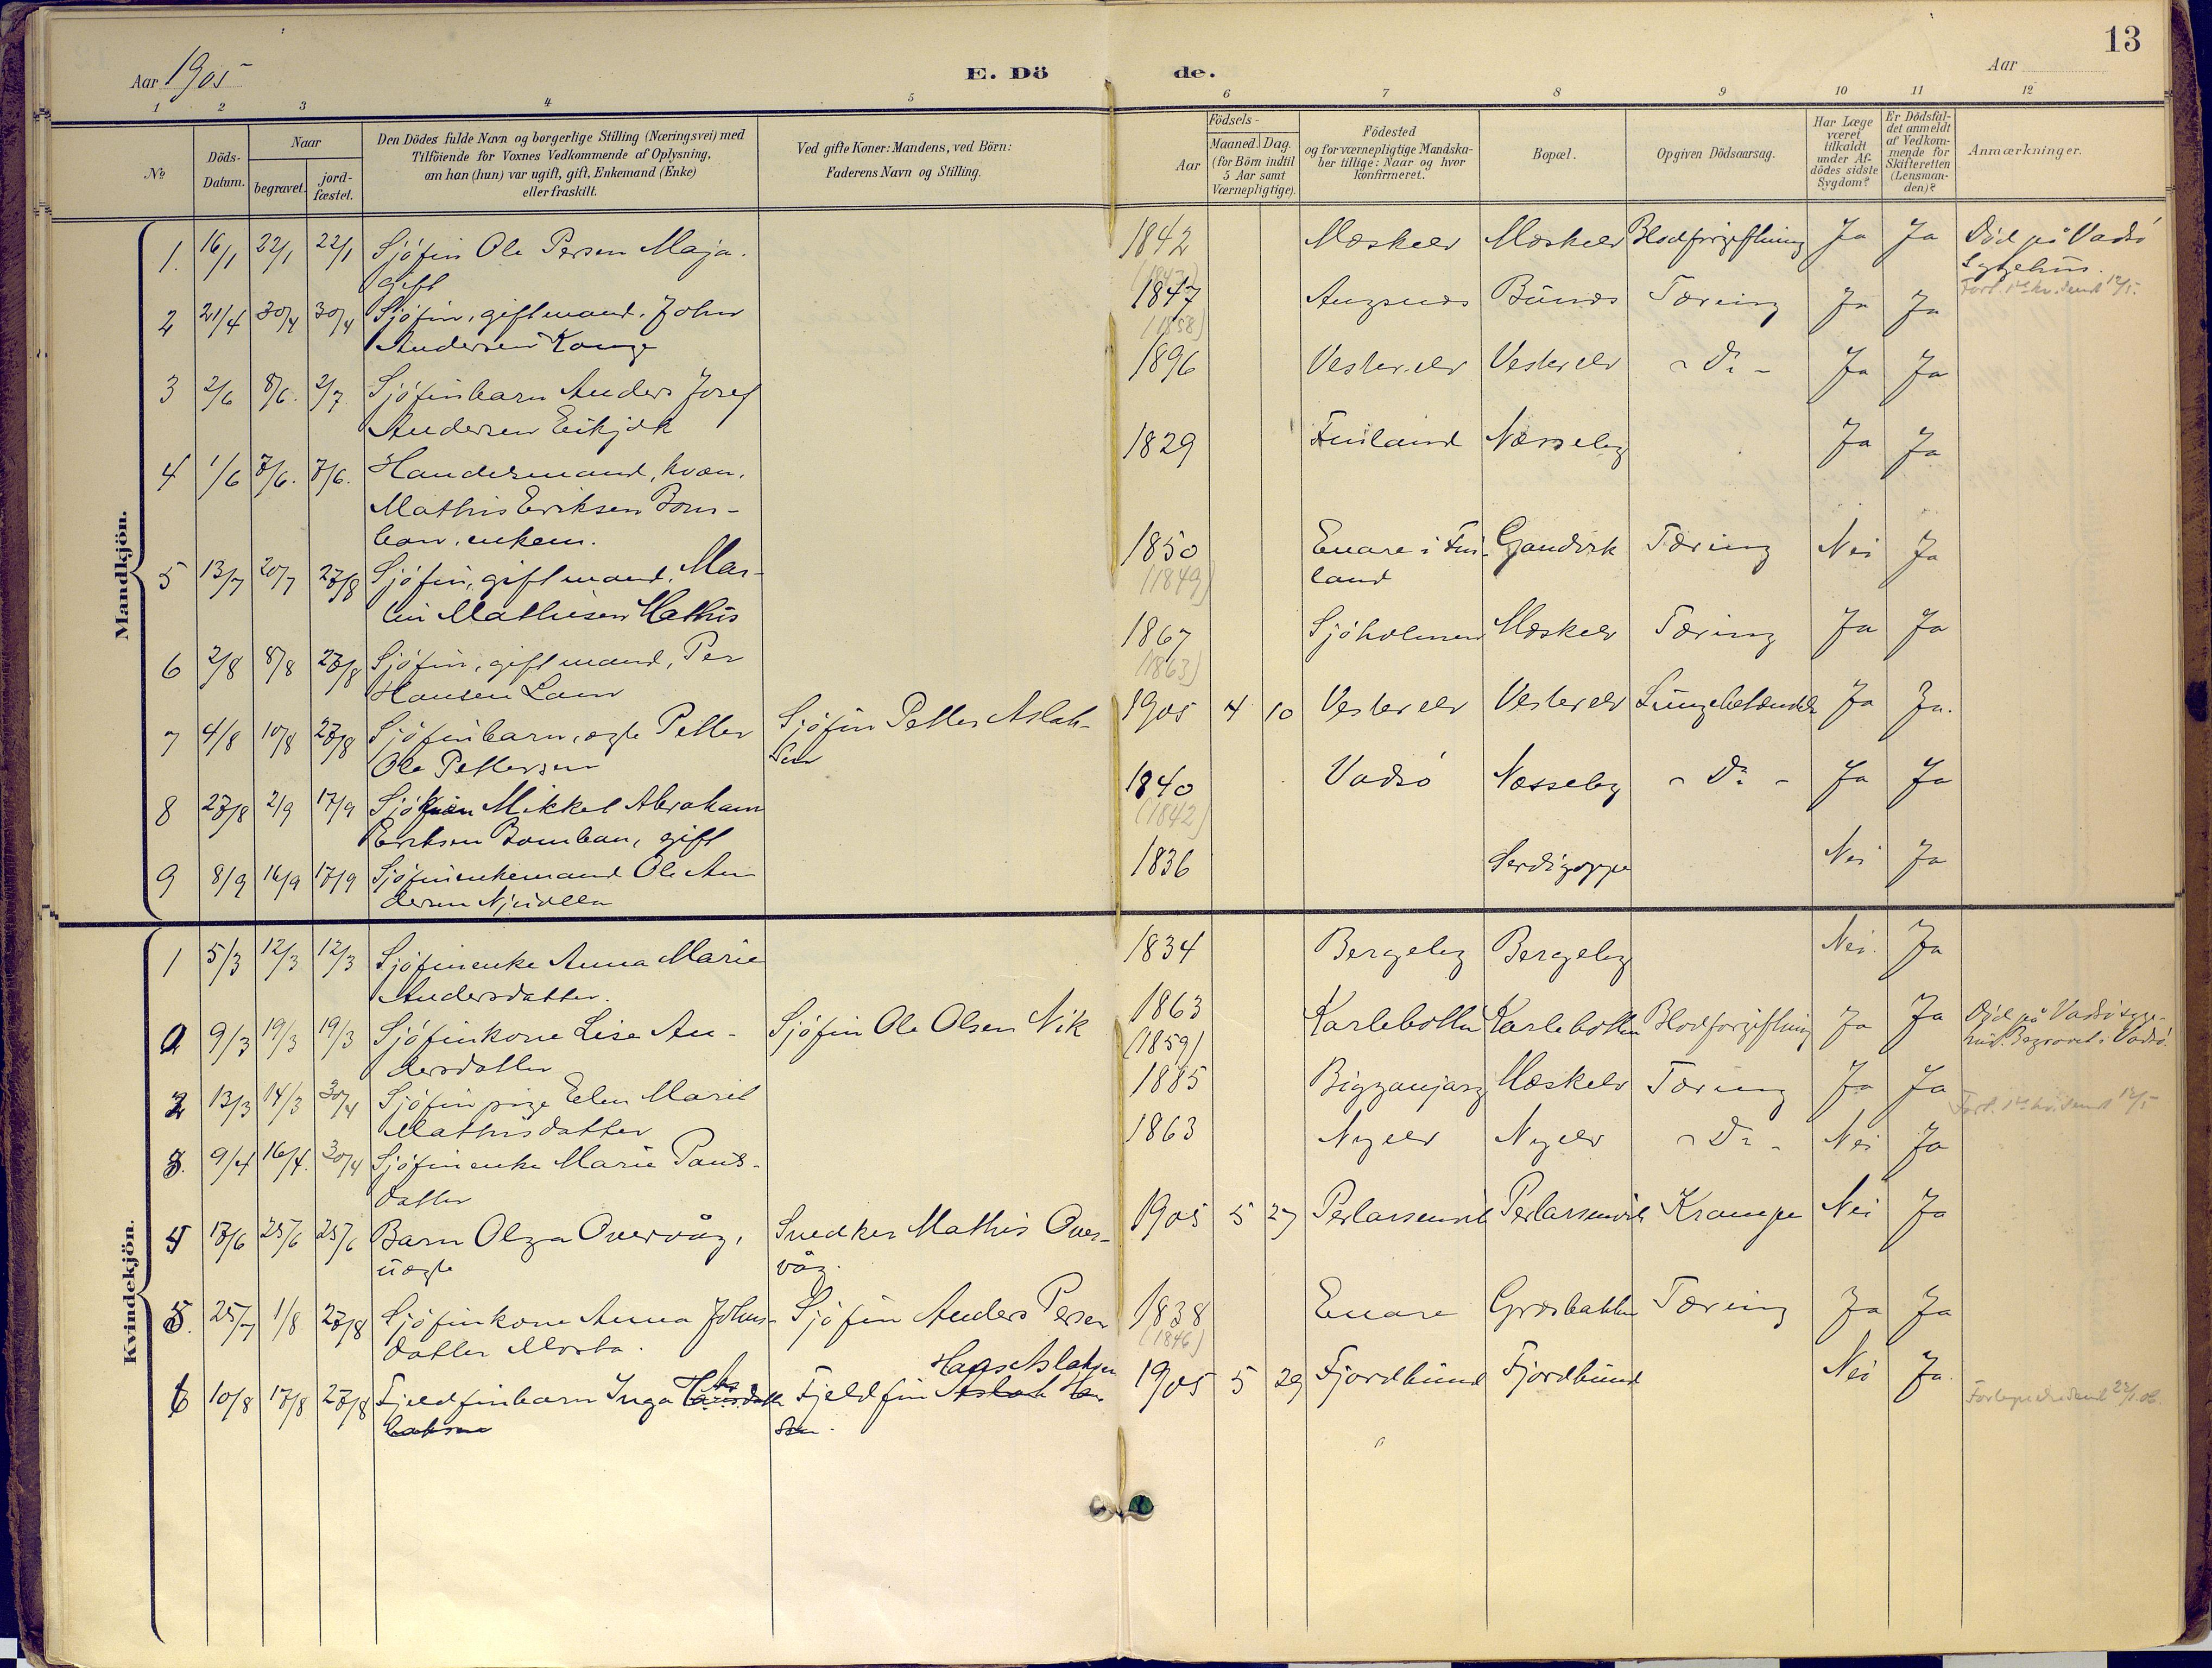 SATØ, Nesseby sokneprestkontor, H/Ha/L0007kirke: Ministerialbok nr. 7, 1898-1921, s. 13